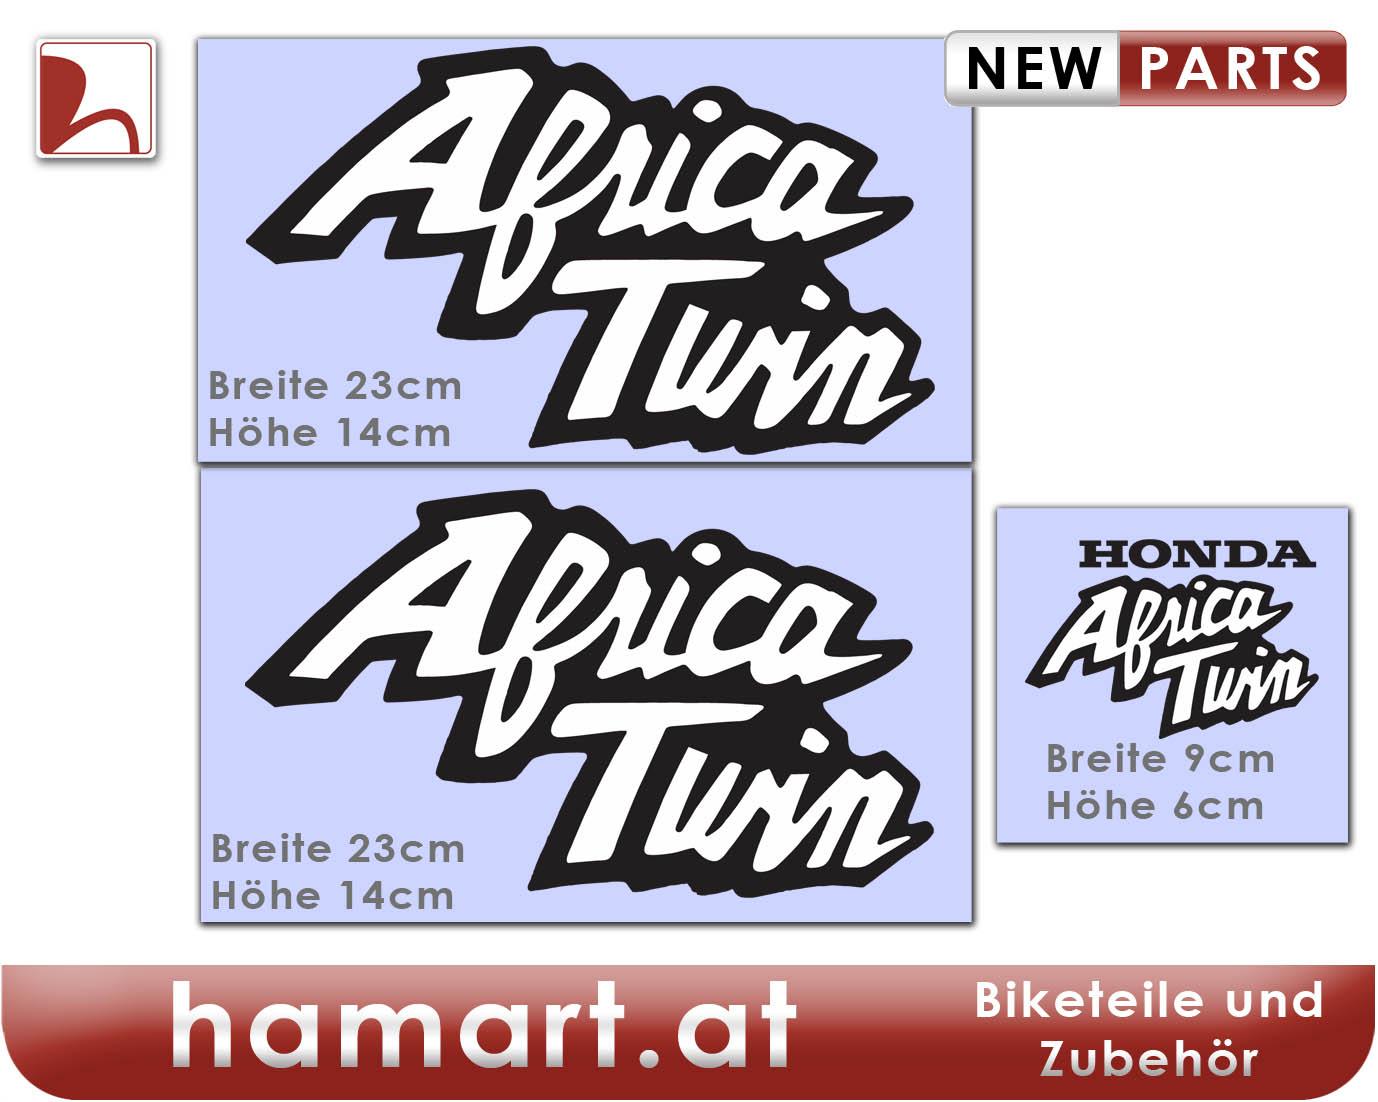 372987000/Kit Kette Ring Kettensatz DID HONDA XRV 750/Africa Twin 1997/750/cc